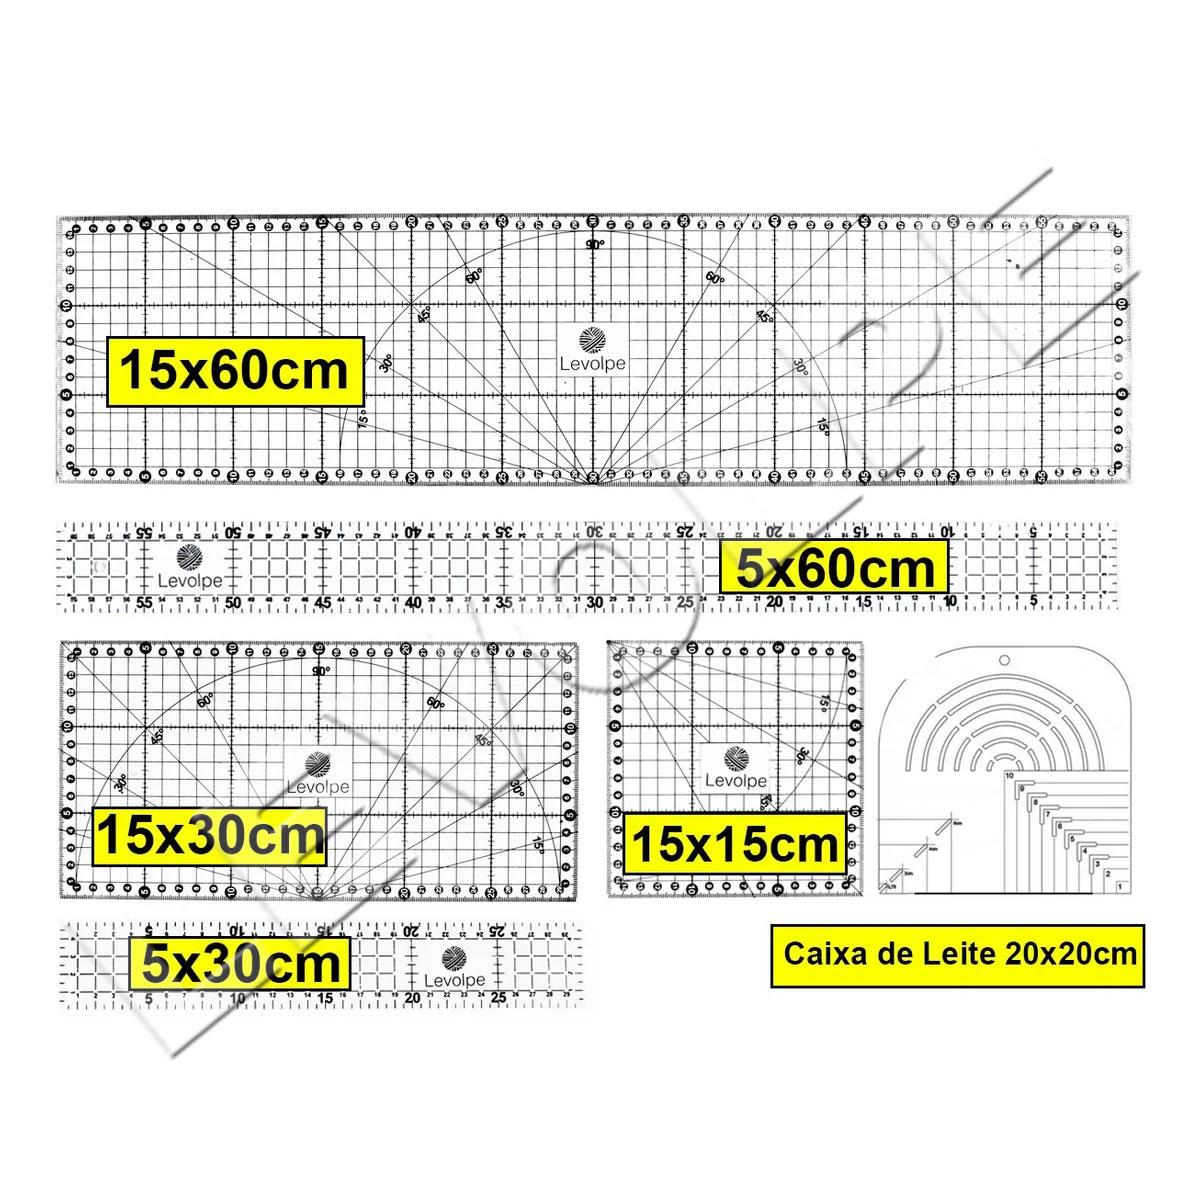 Kit Réguas 15x60 15x30 5x60 5x30 15x15 Caixa De Leite Patchwork